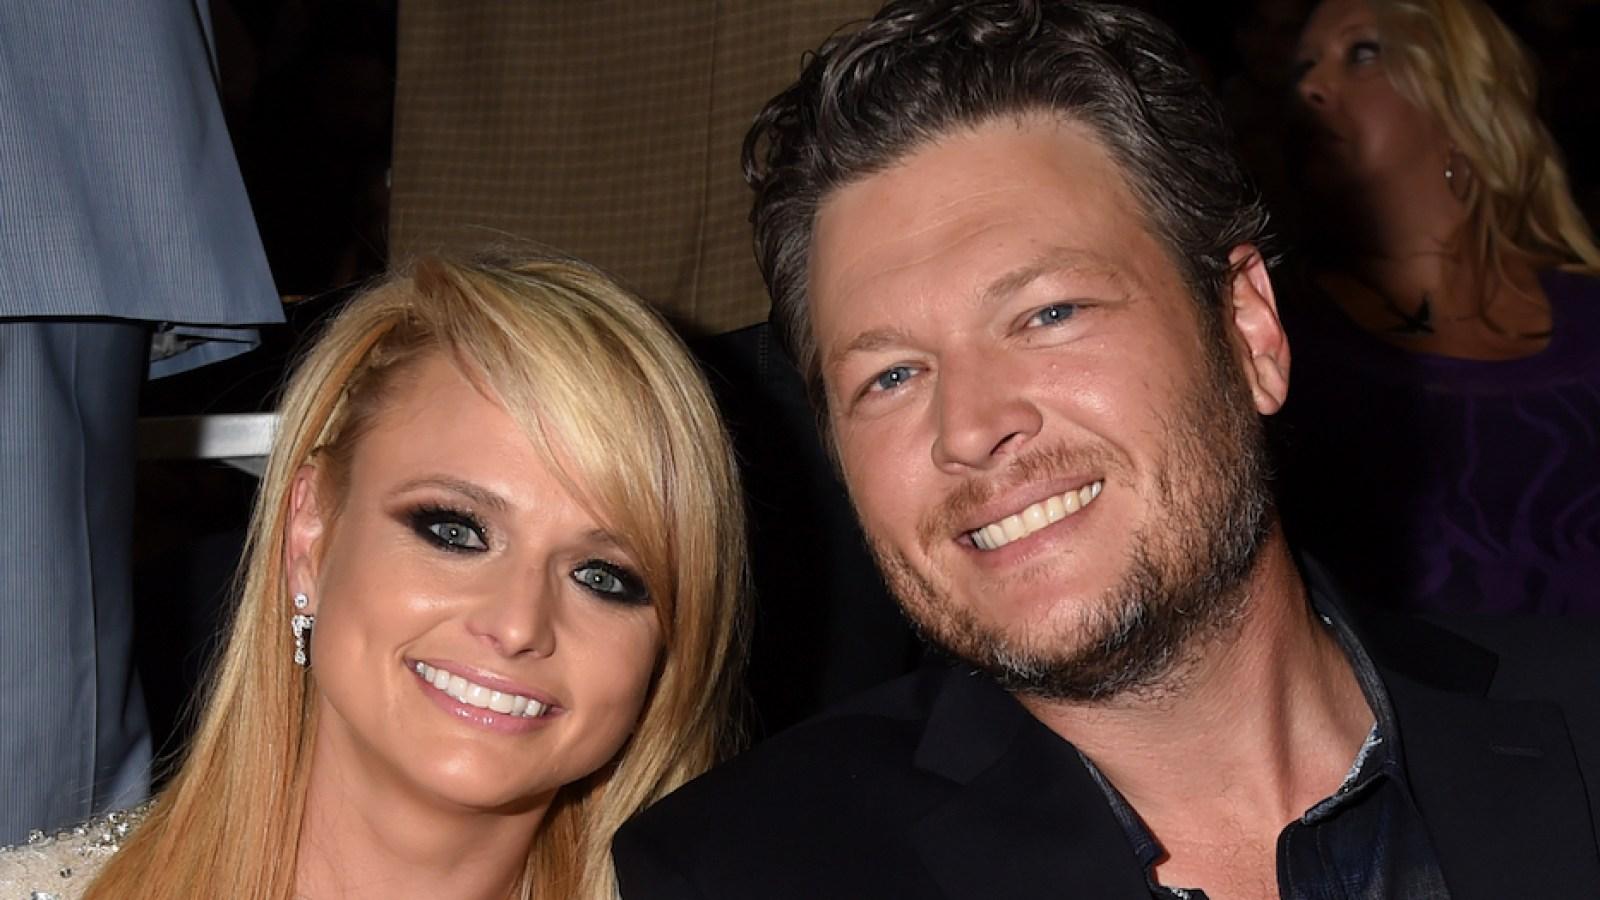 Blake Shelton Wasn't 'Given a Heads-Up' About Miranda